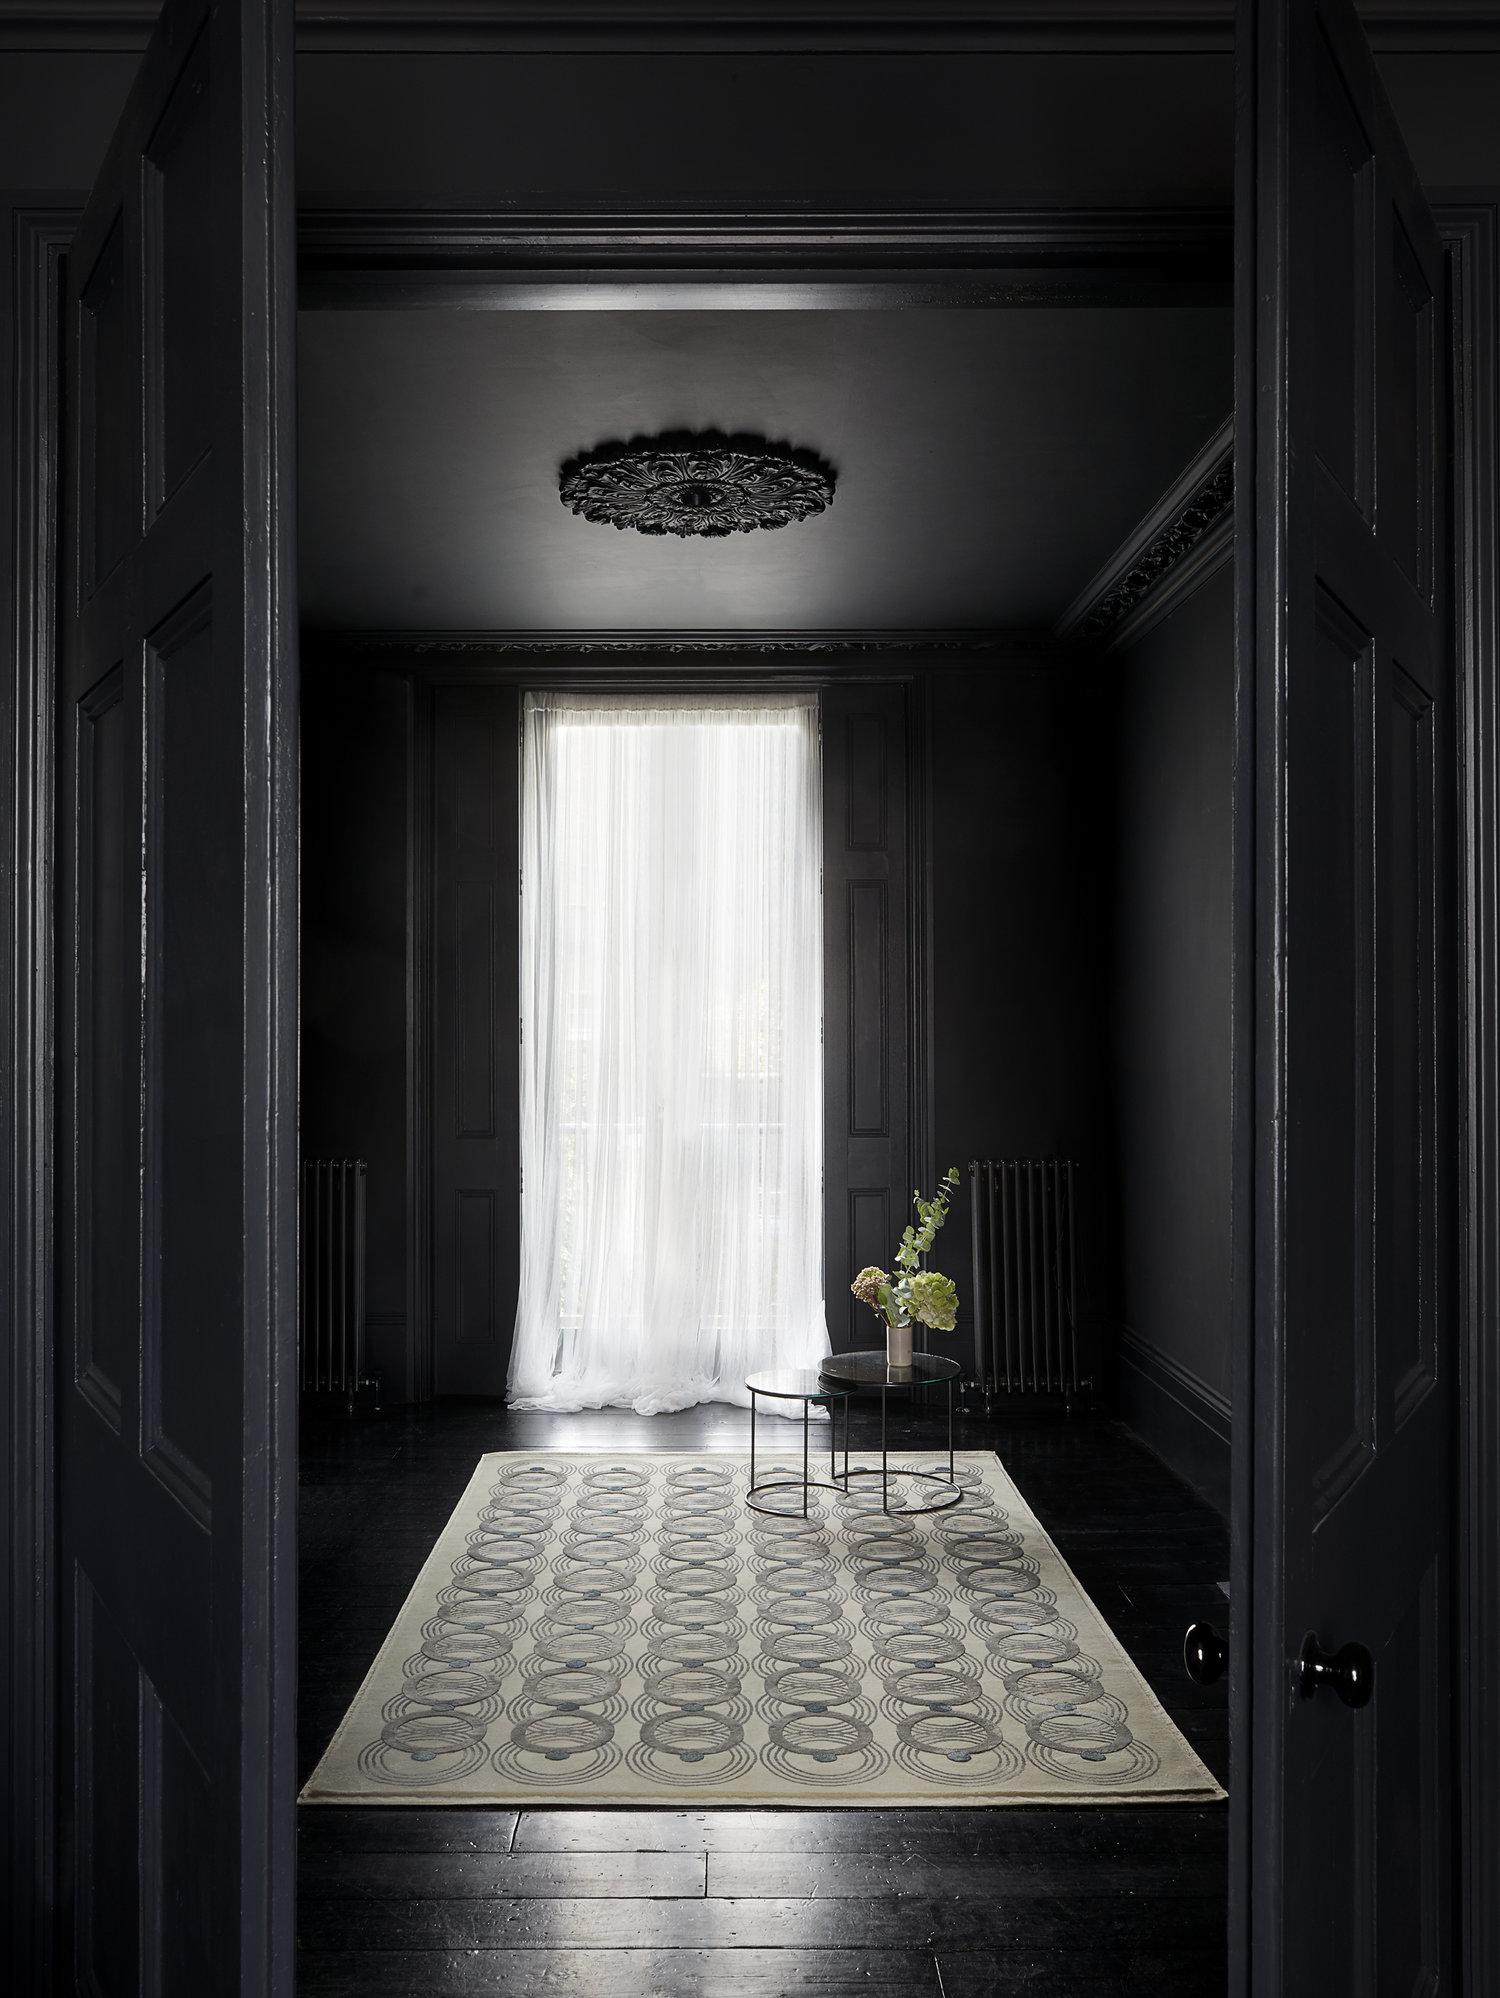 Loop dove cream rug